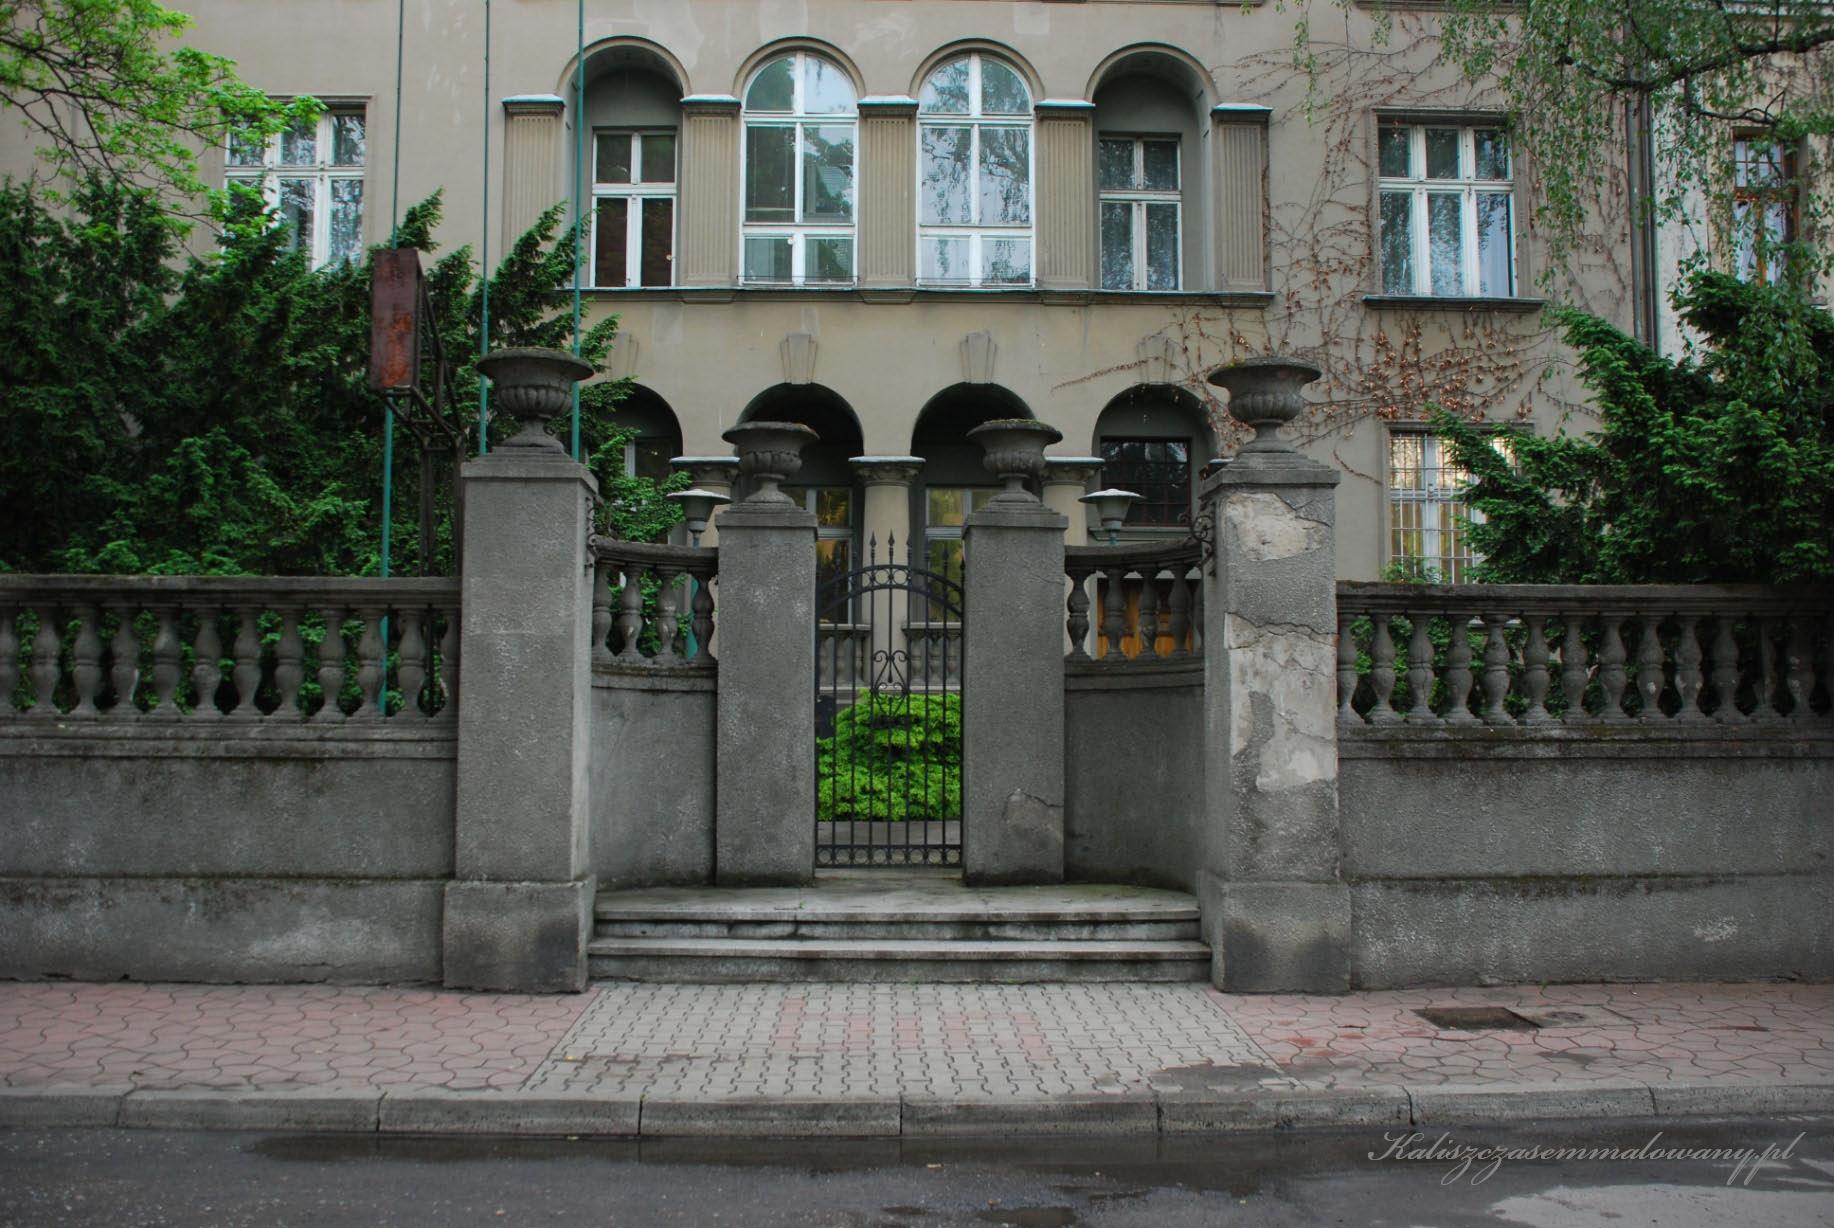 Dom_pod_anilolami-24